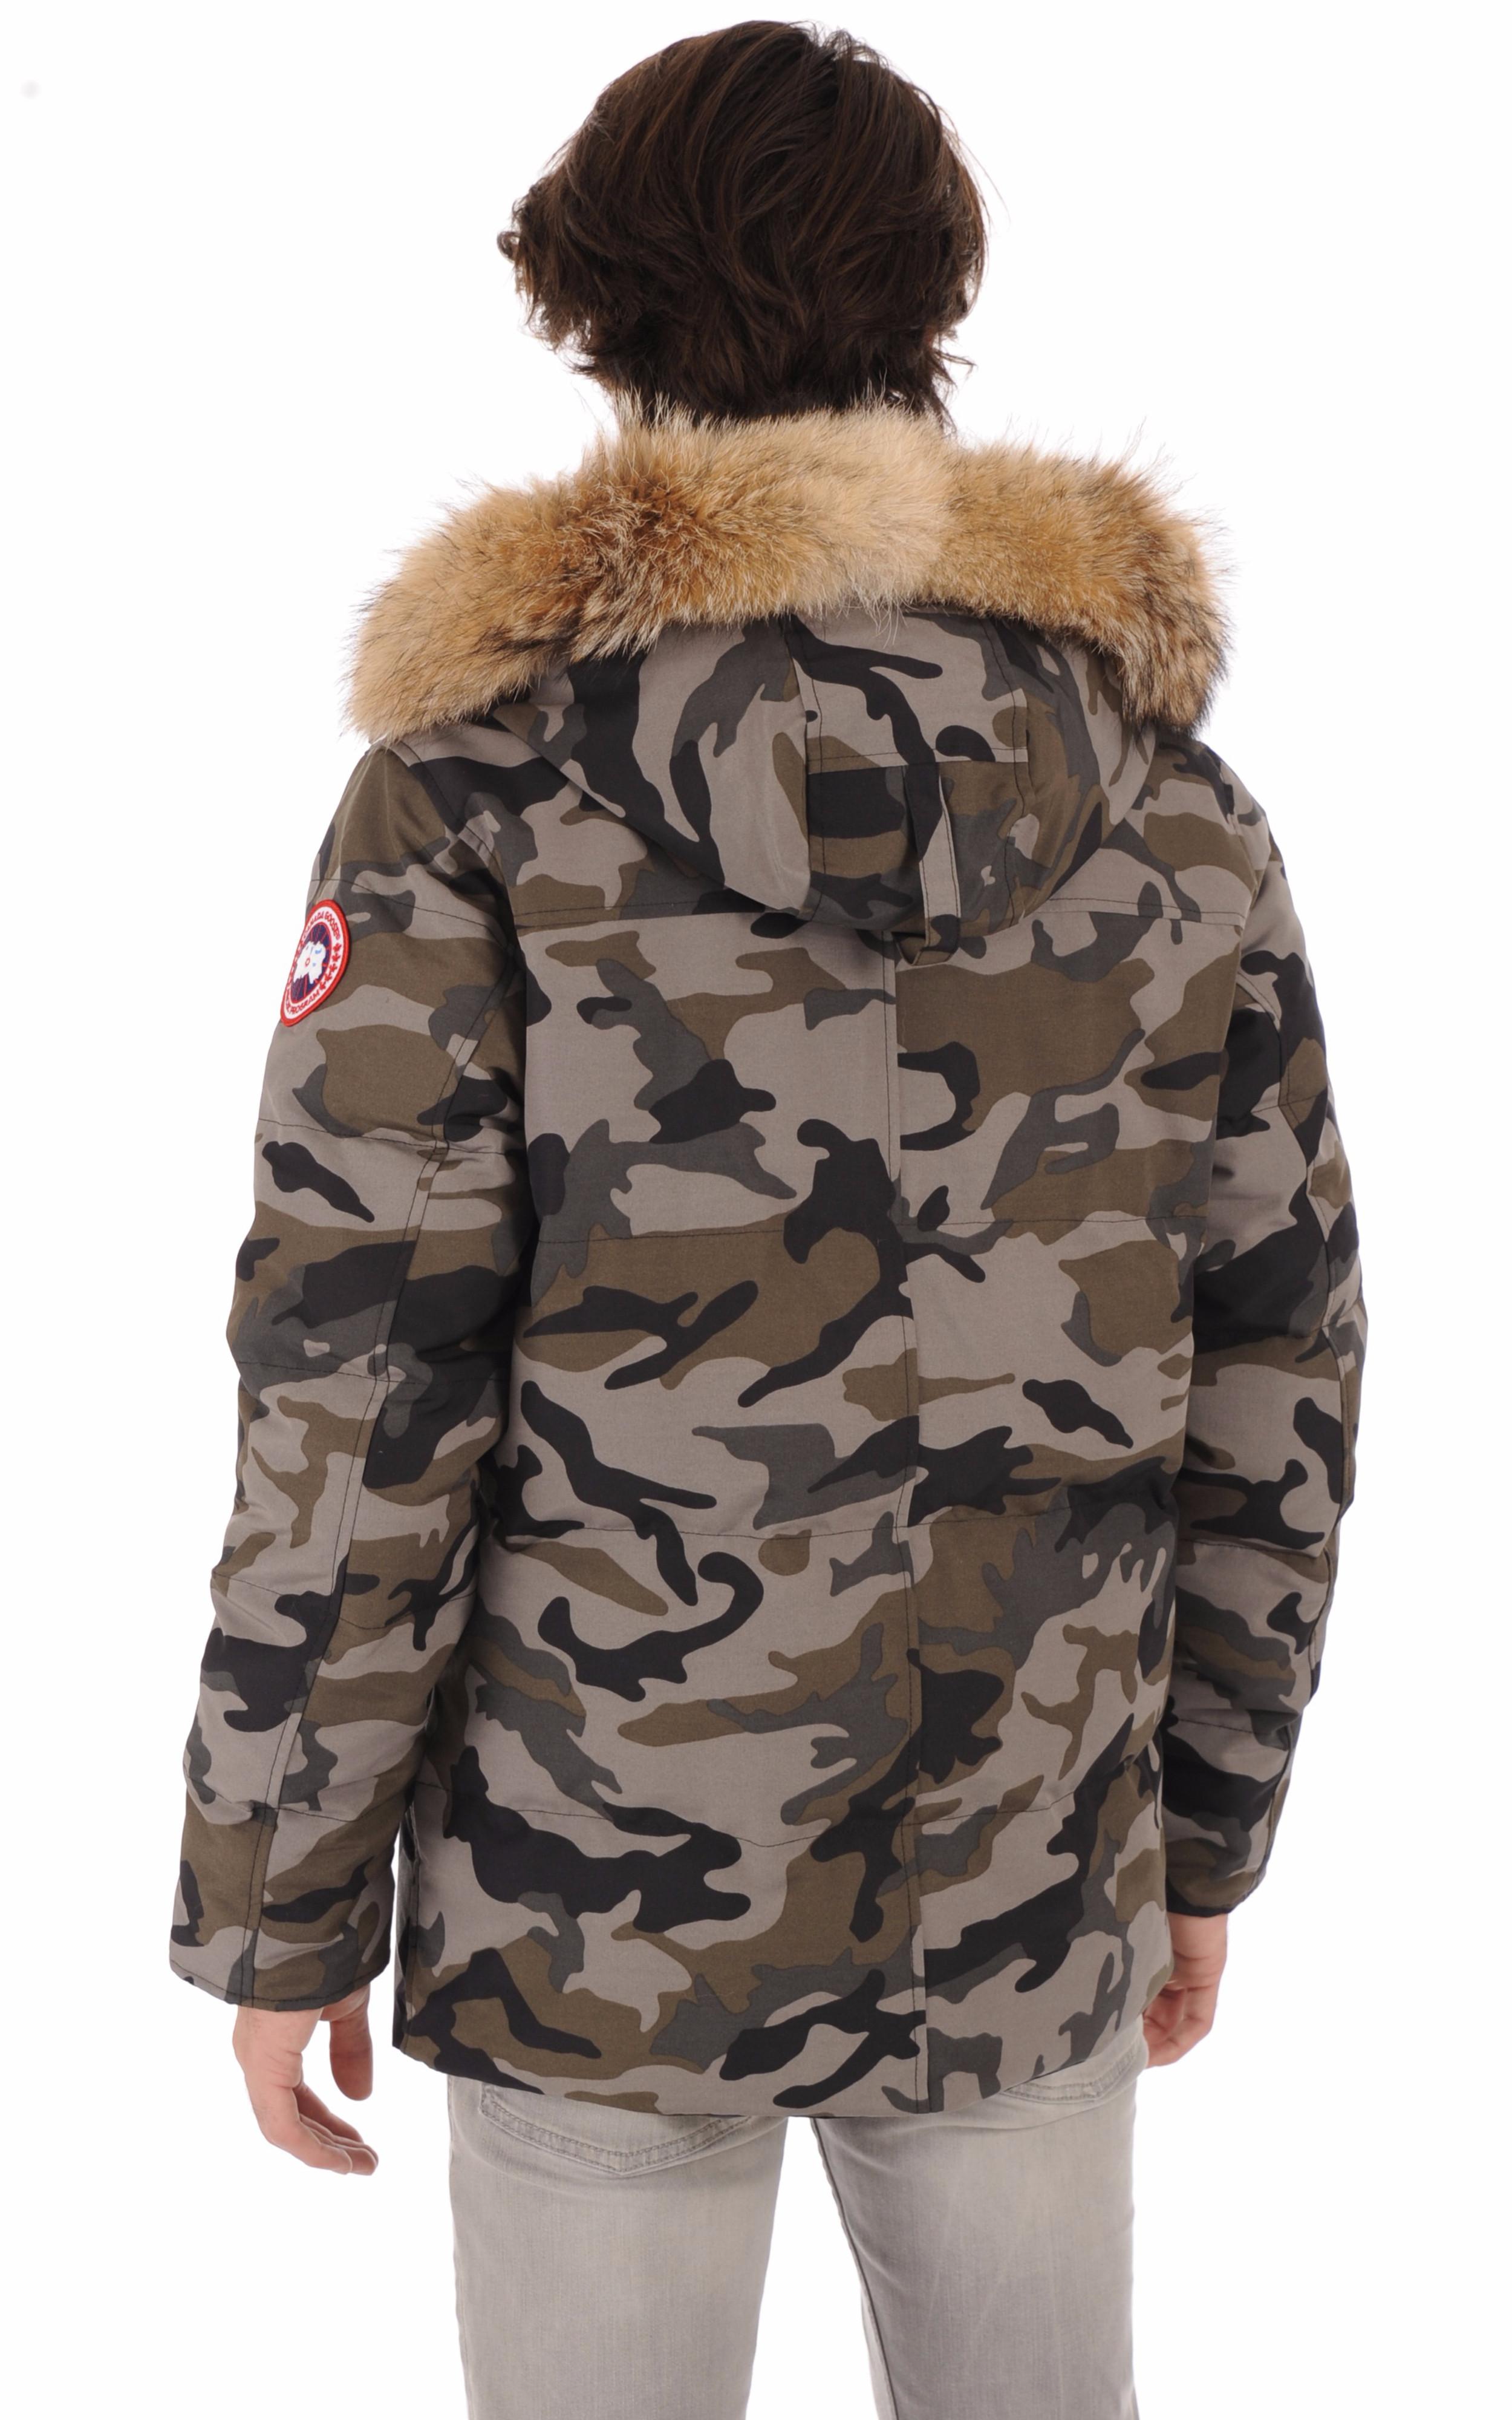 Parka Wyndham camouflage Canada Goose